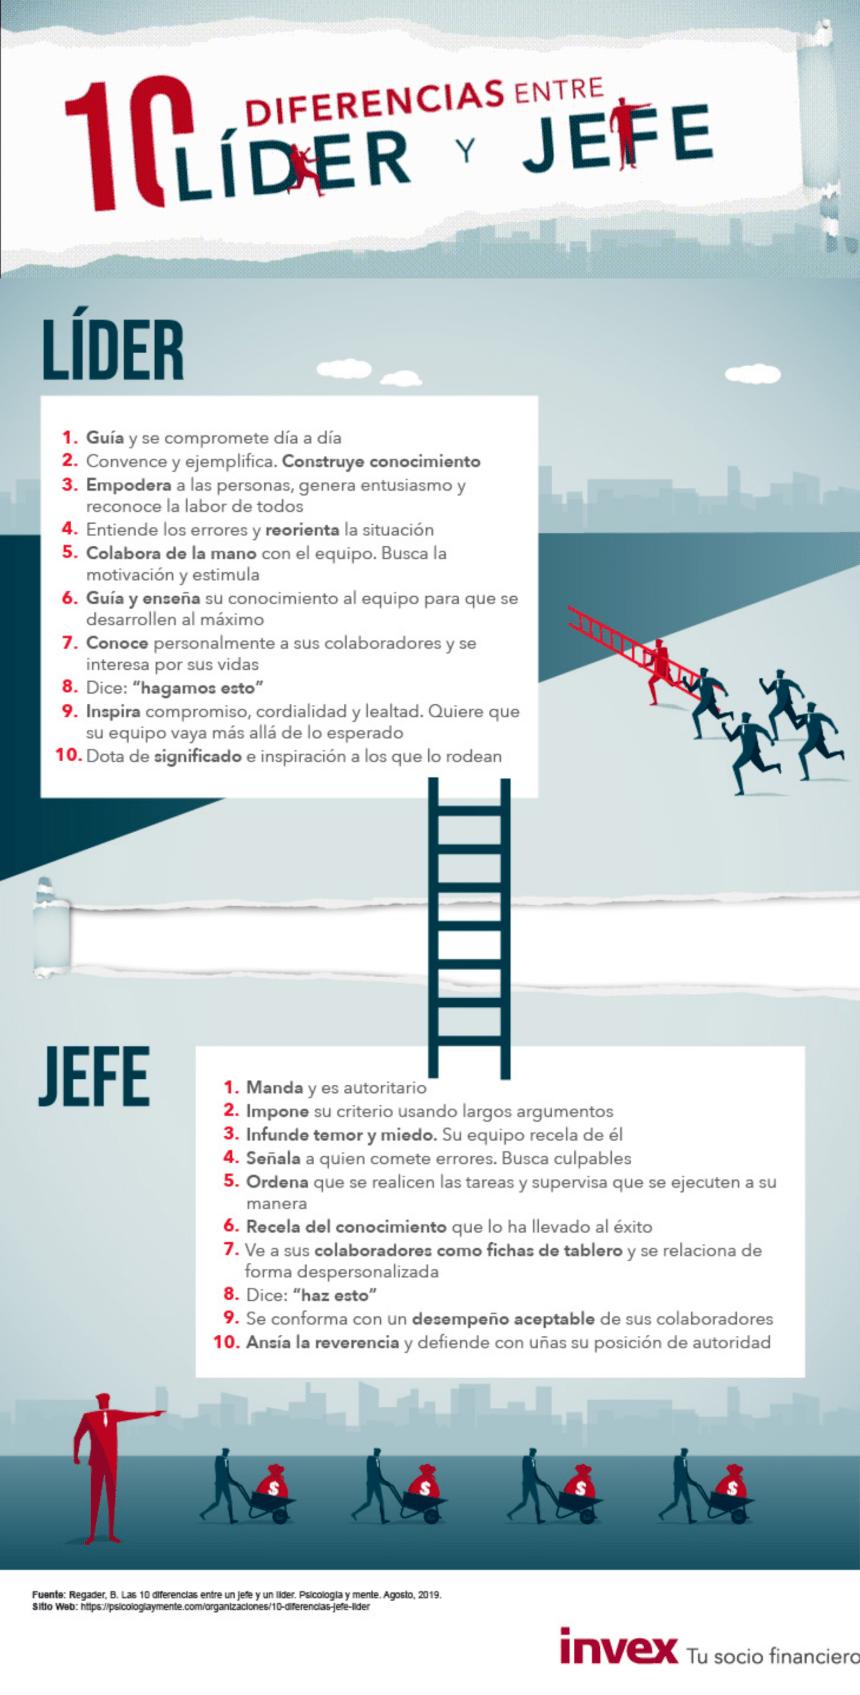 10 diferencias entre líder y jefe #infografia #leadership #rrhh